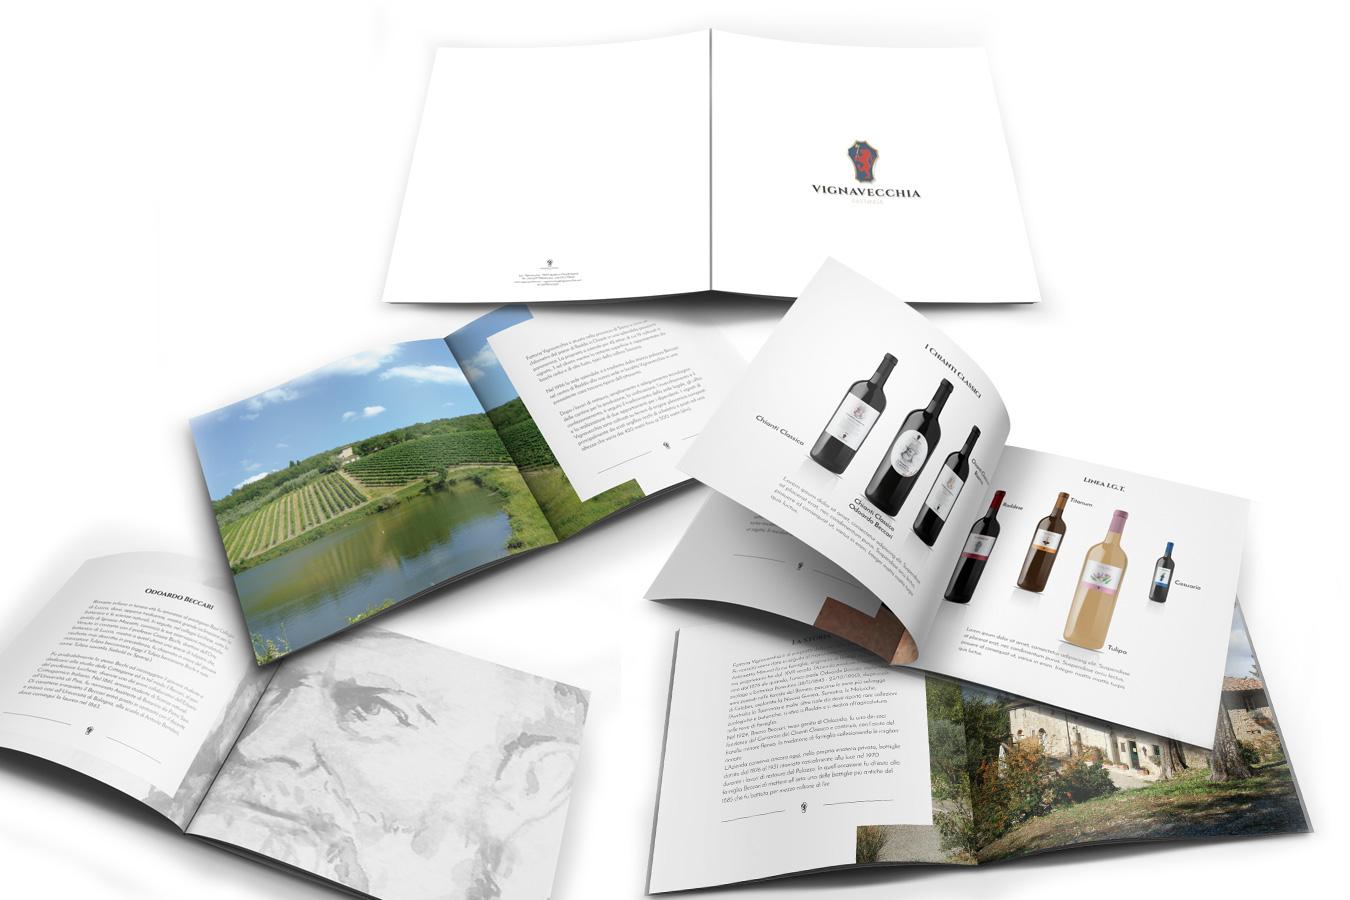 Vignavecchia brochure